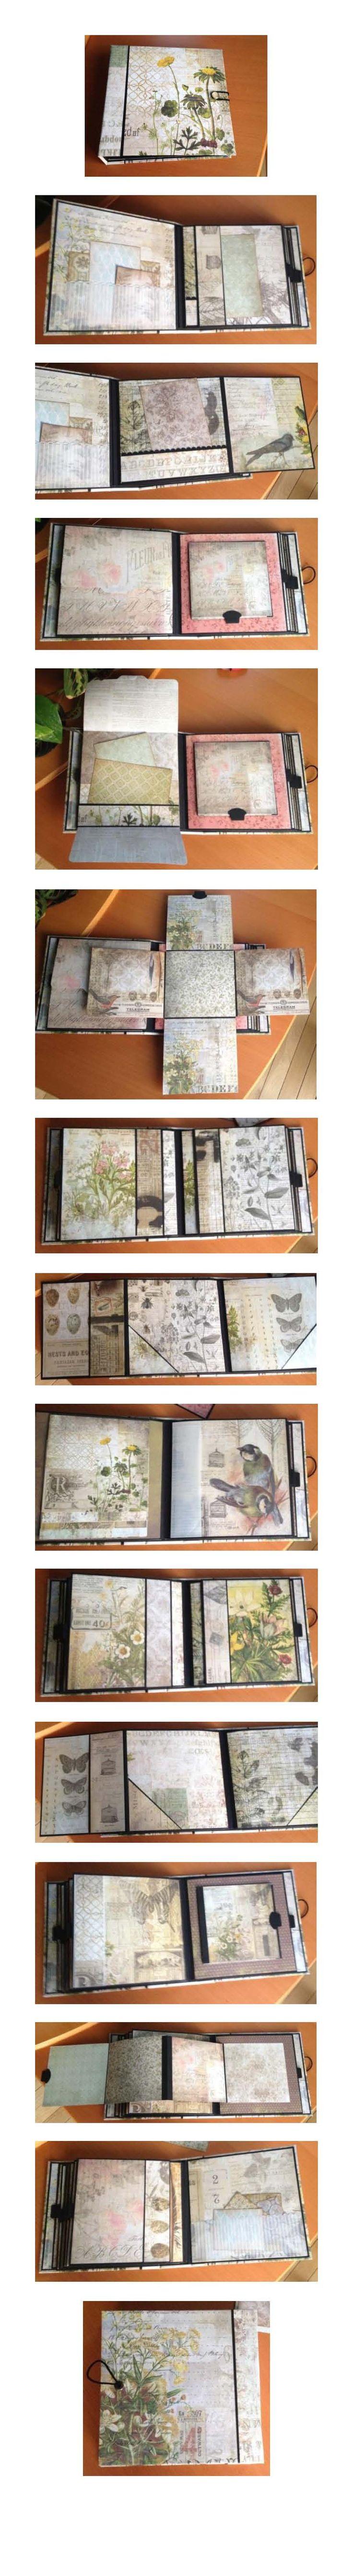 8x8 mini album using Tim Holtz Wallflower papers